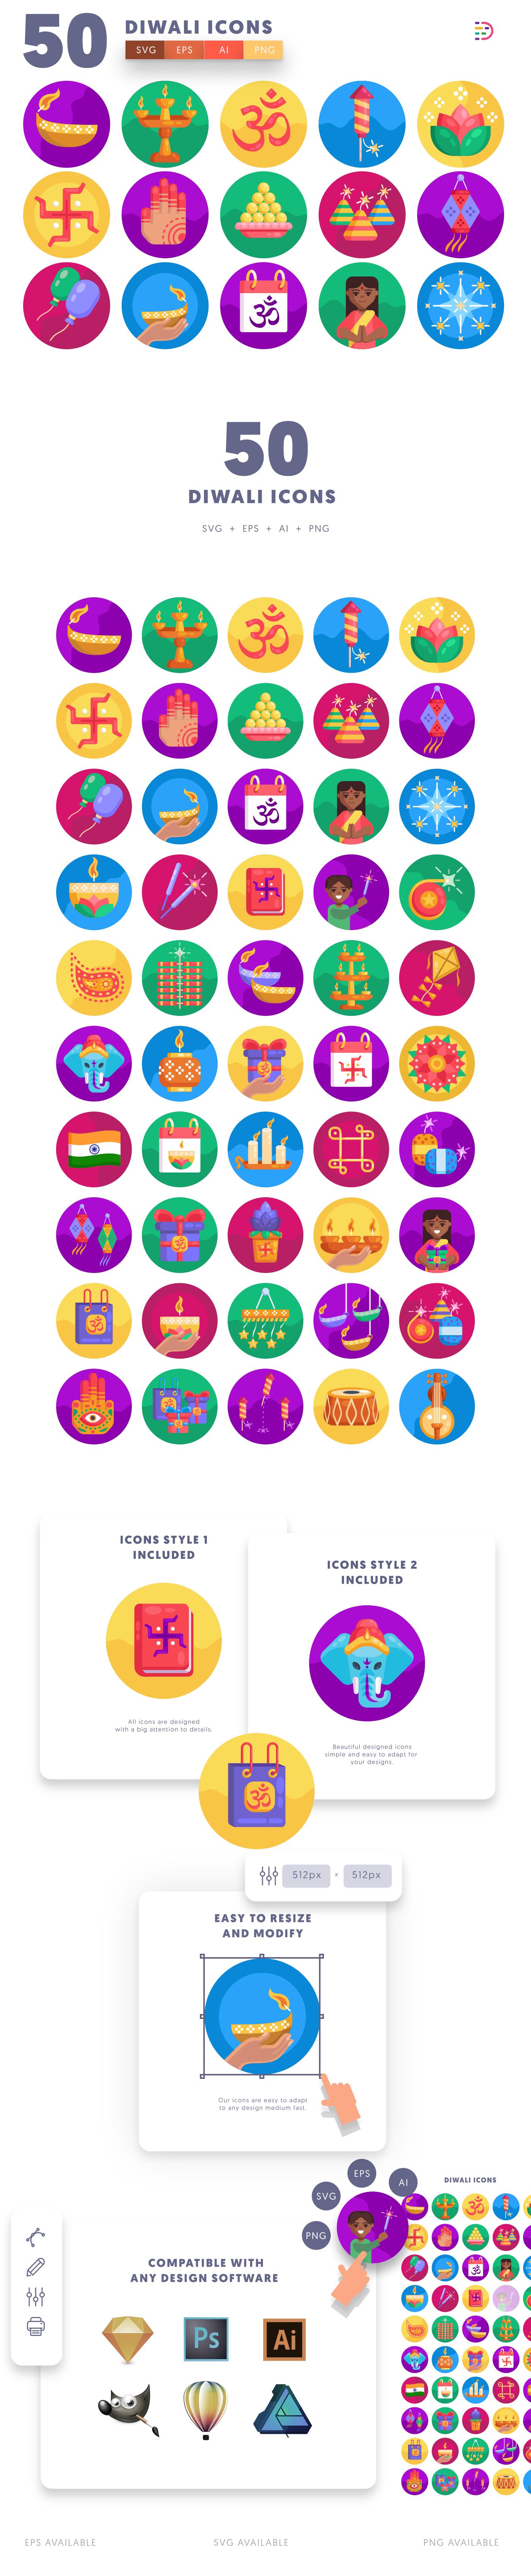 Diwali icons info graphic